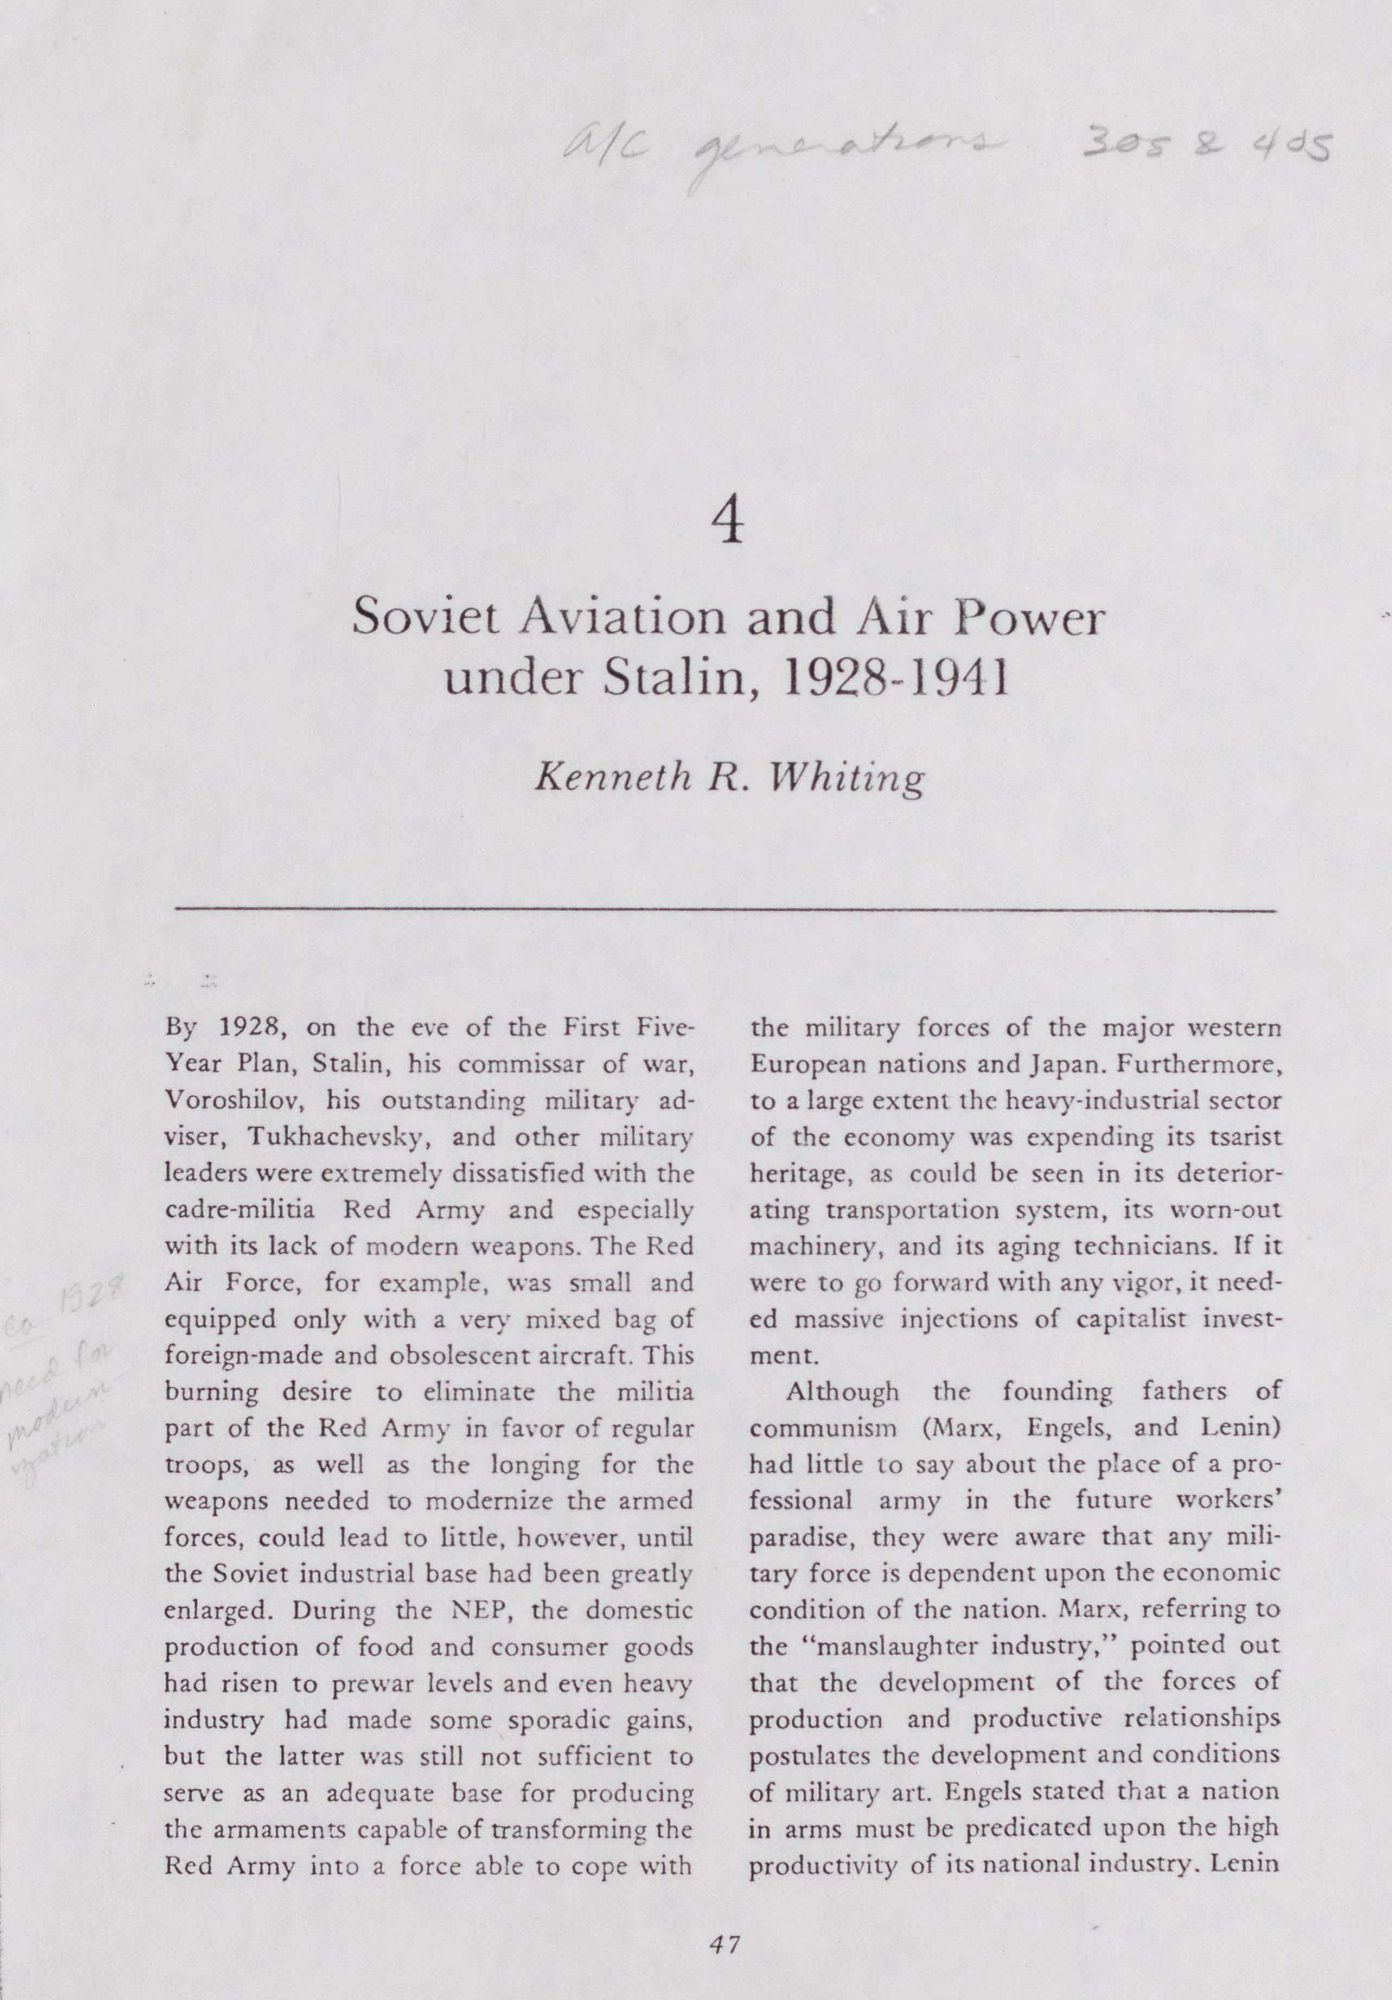 Soviet Aviation and Air Power Under Stalin, 1928-1941